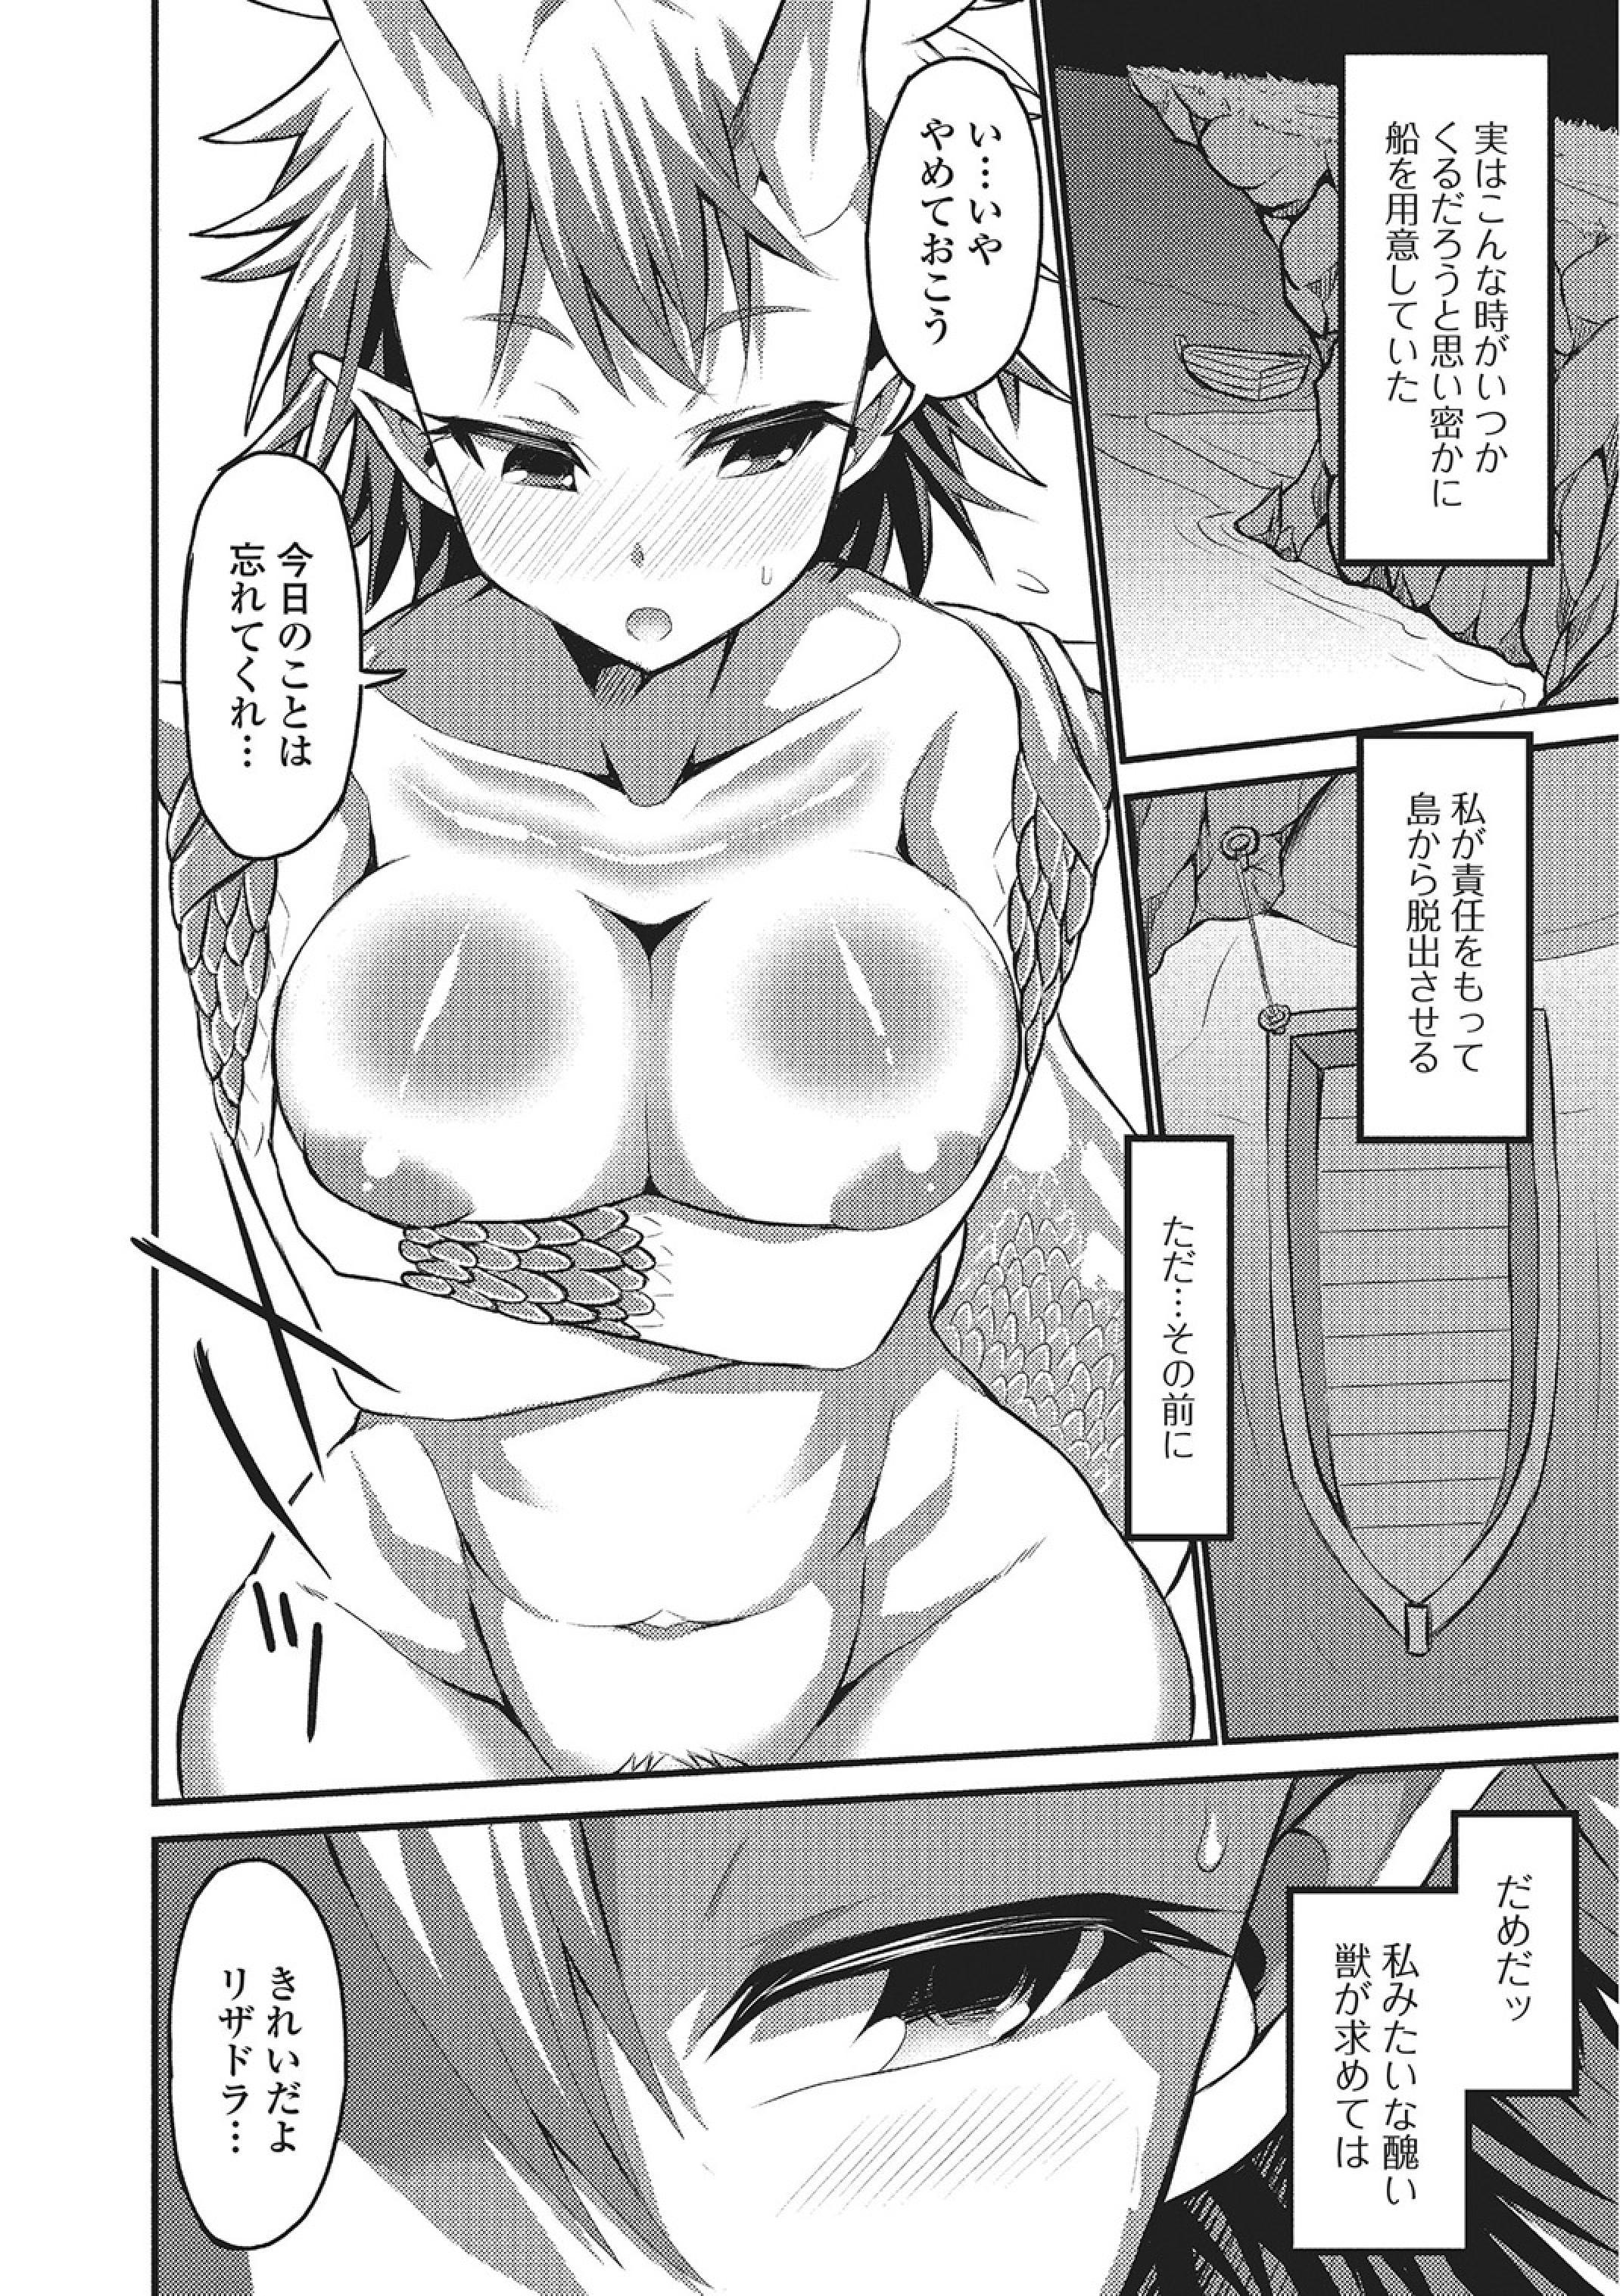 Monster Shoujo e no Yokujou 162